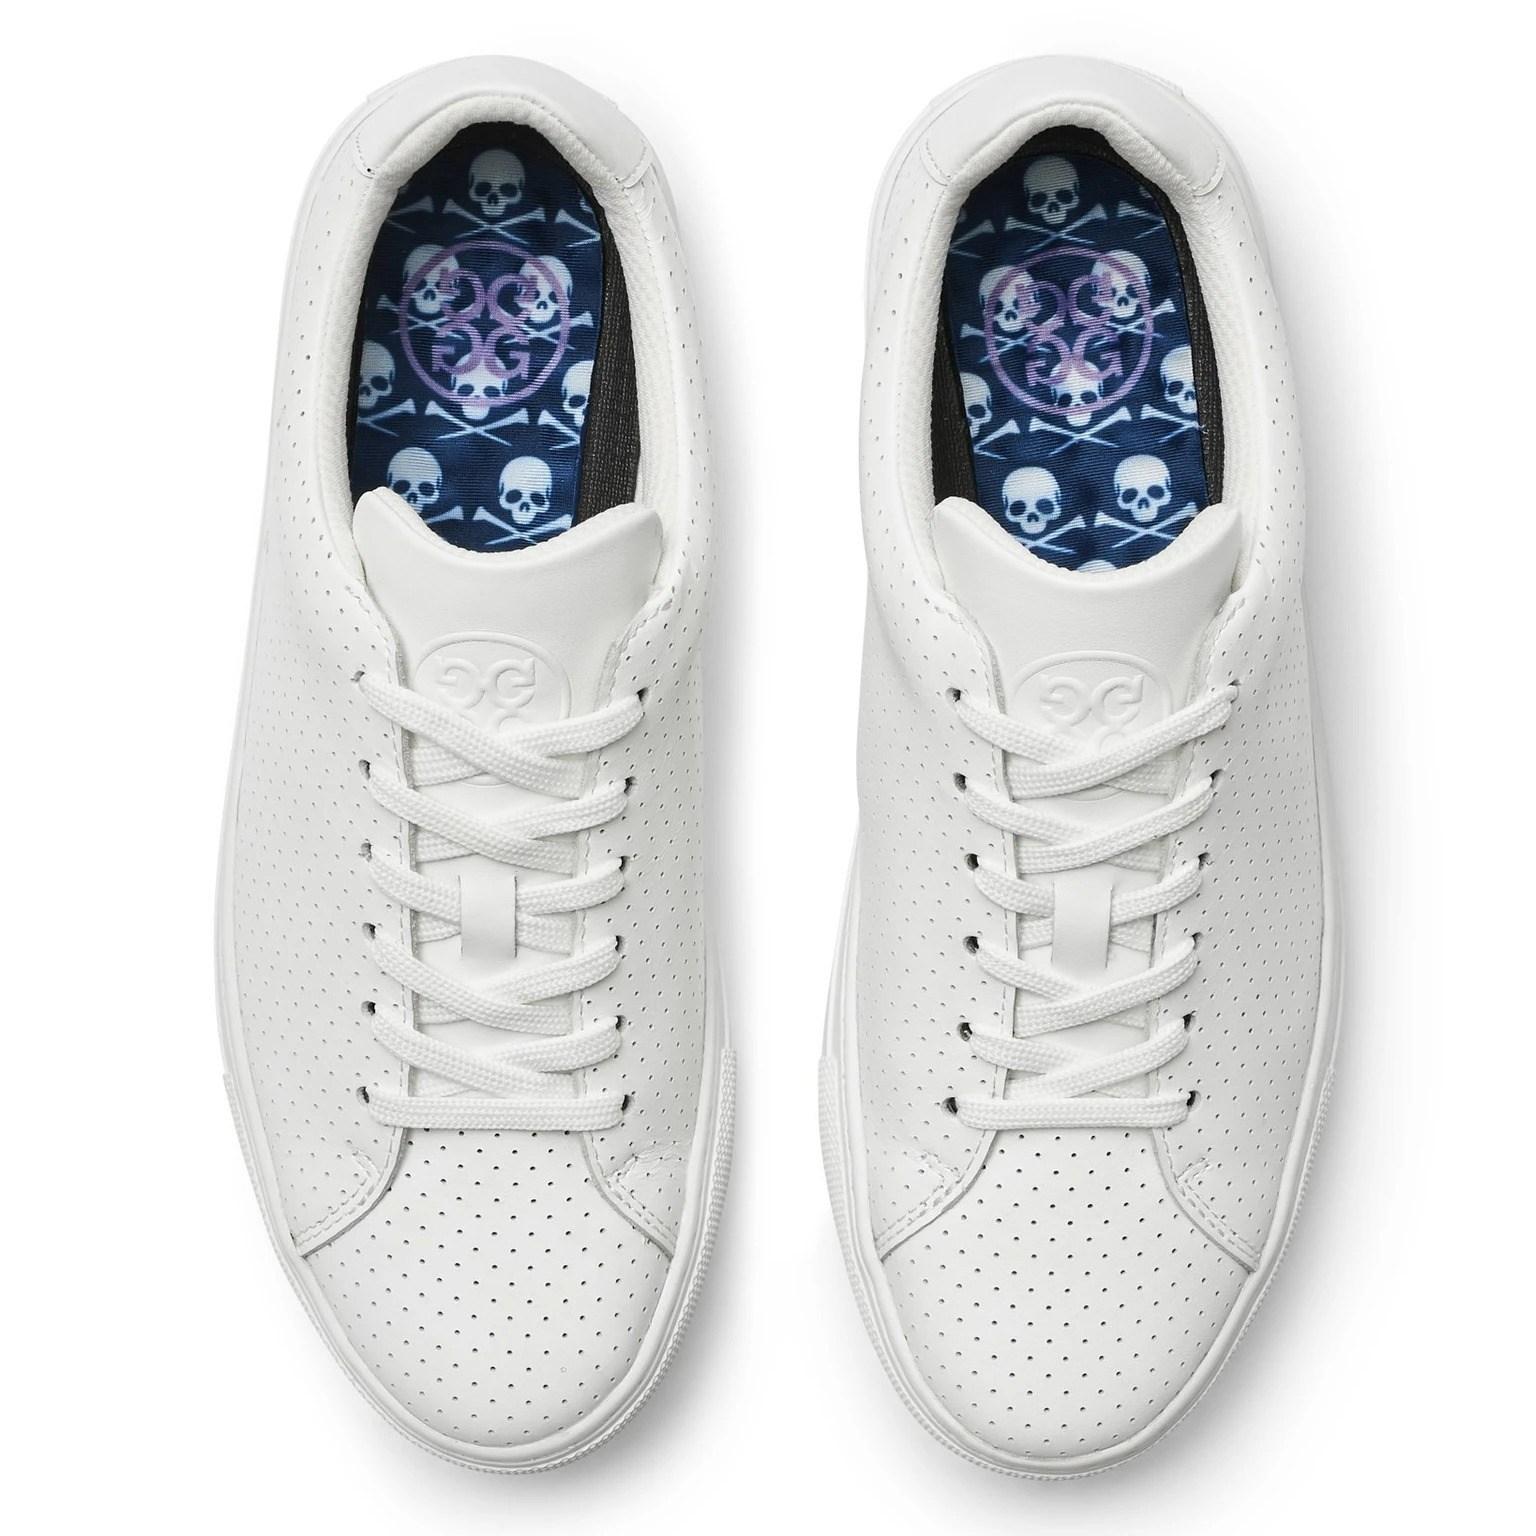 g4골프화 - Gfore 지포어 퍼프 디스럽터 여성 골프화 신발